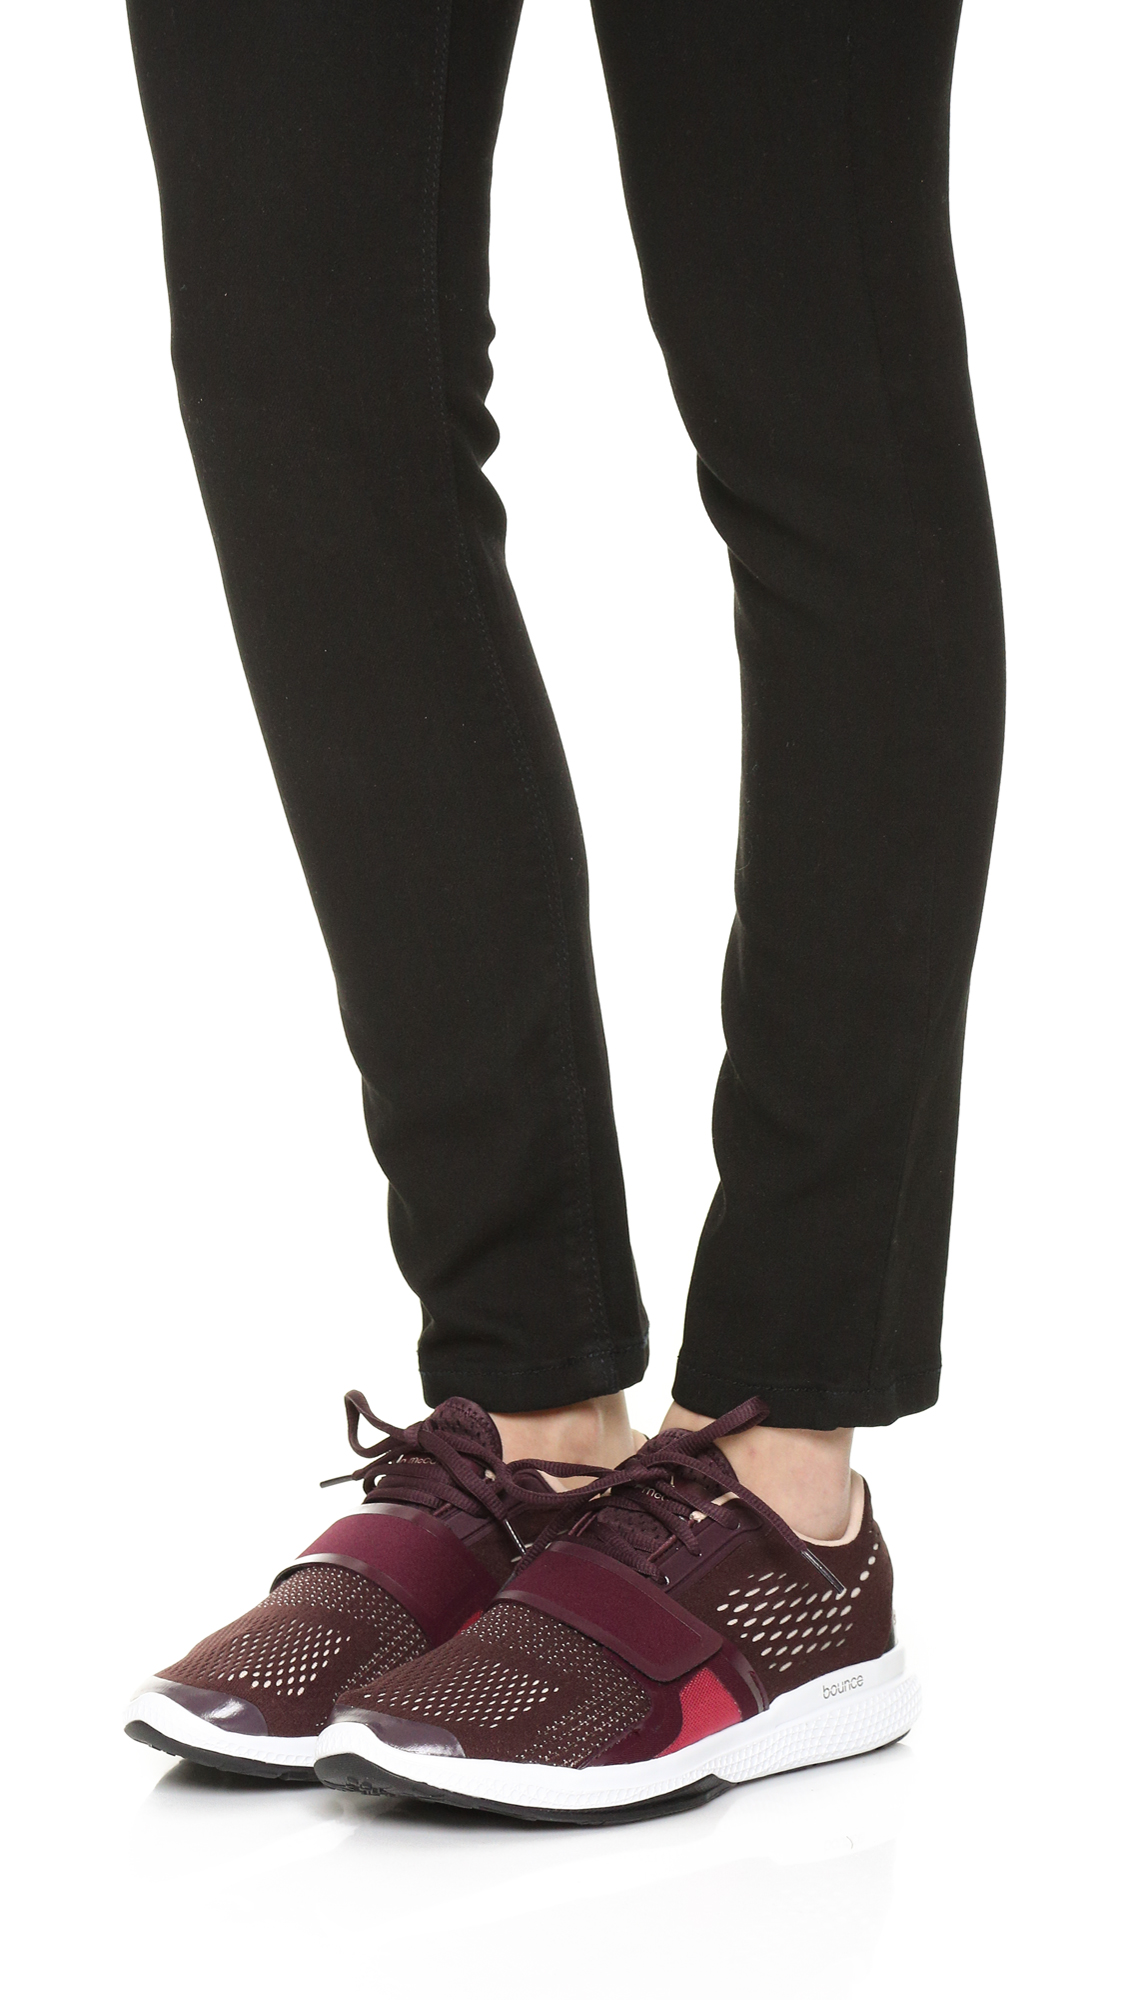 ac1484cfff926 adidas by Stella McCartney Atani Bounce Sneakers